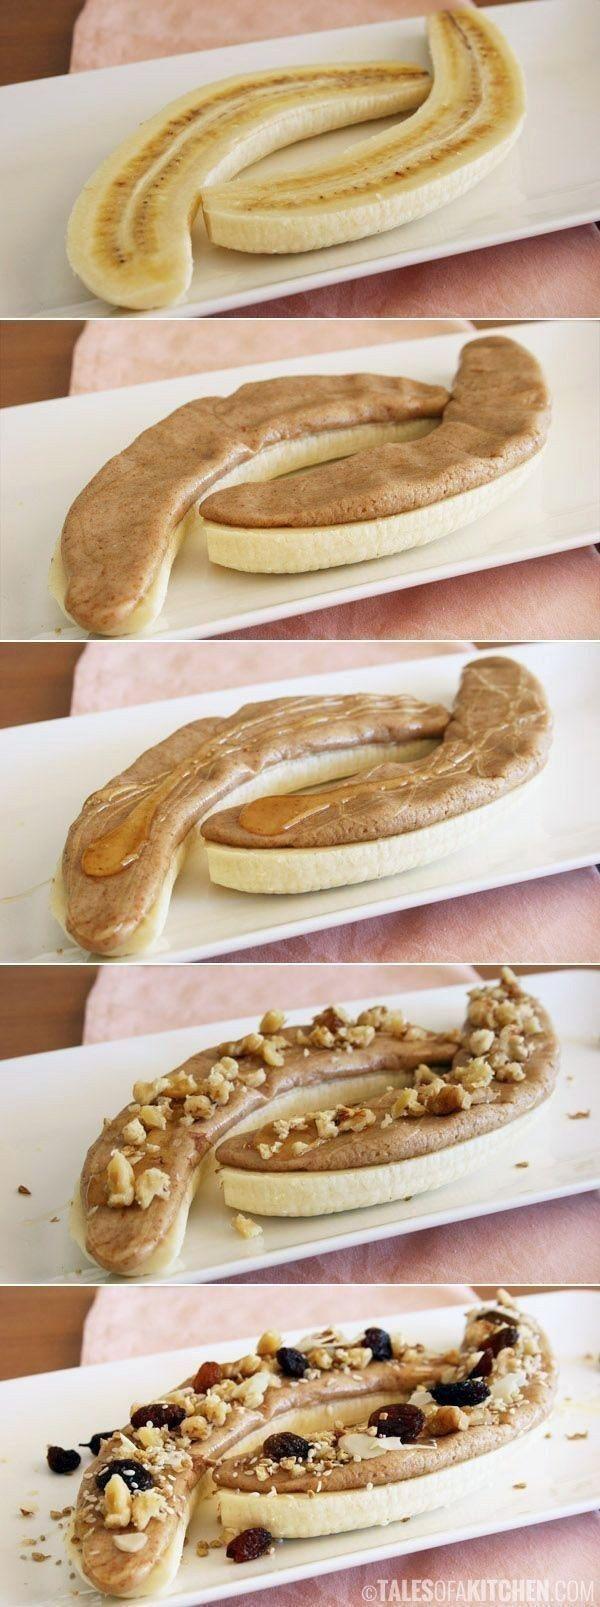 Almond Butter & Banana Open-Faced Sandwich | 21 Back-To-School Breakfast Recipes That Kids Will Love